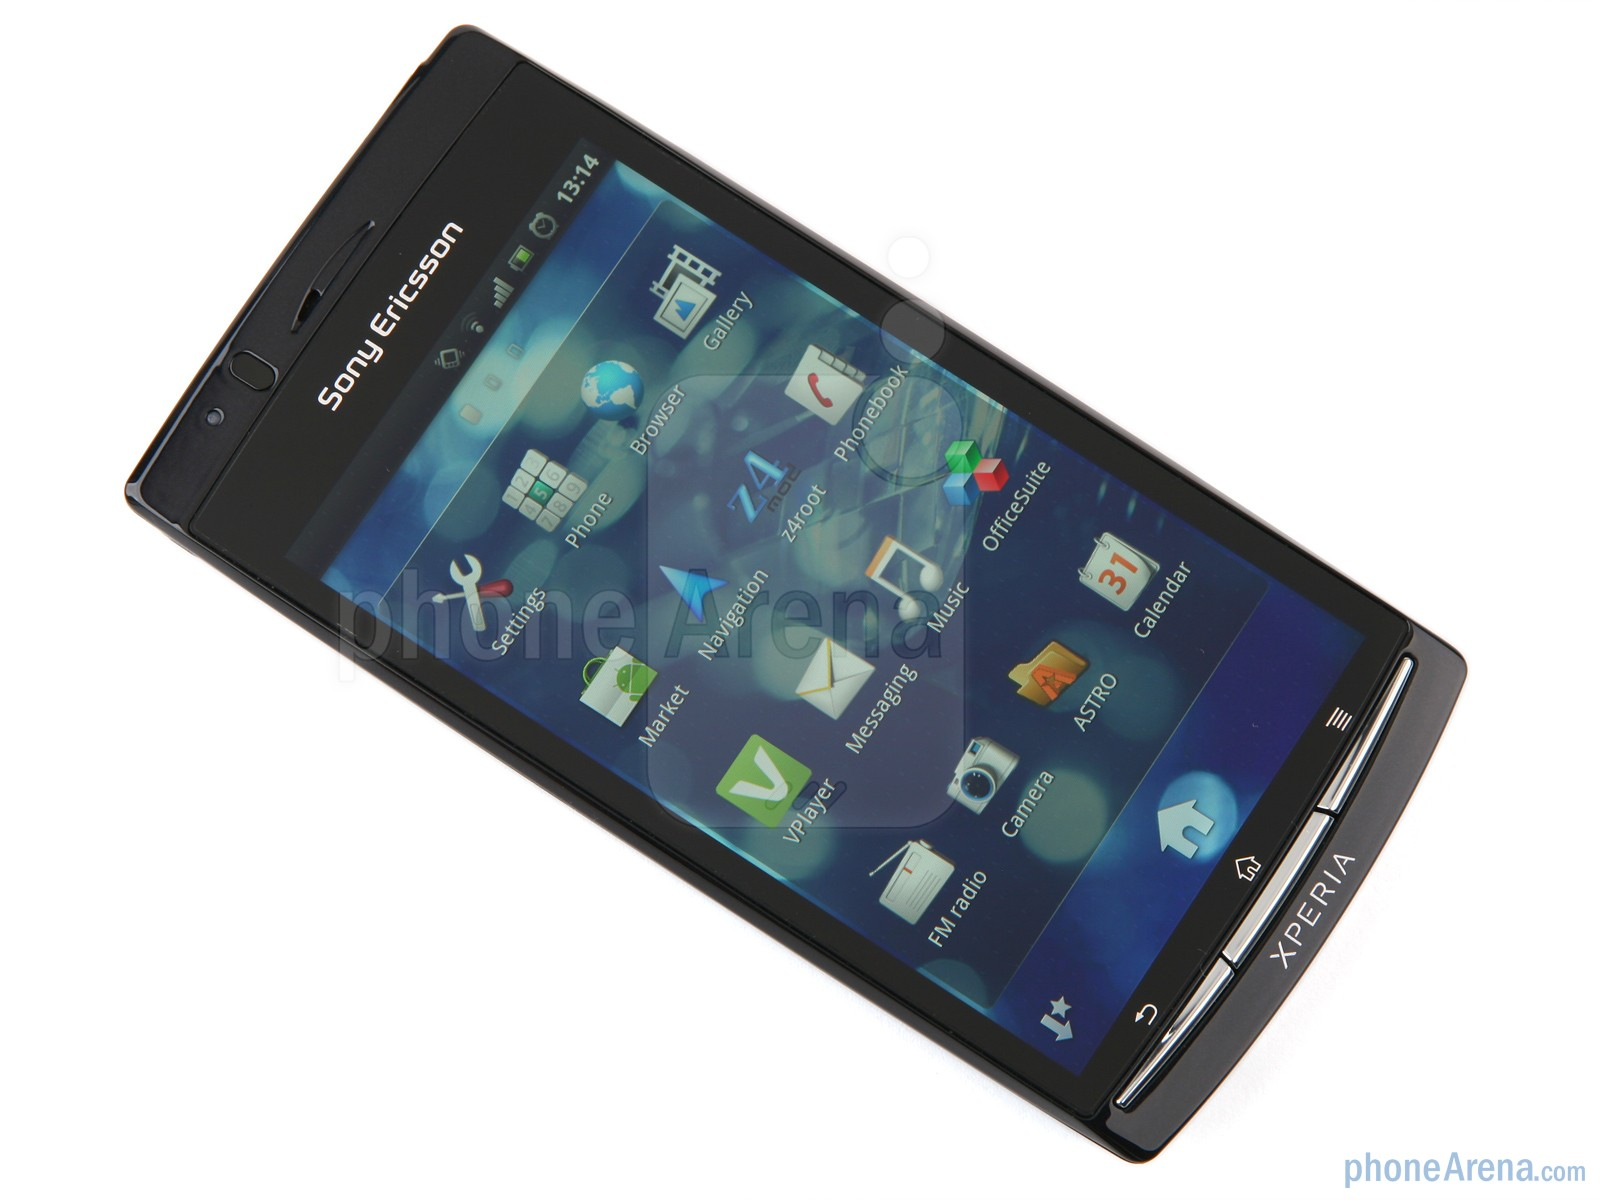 Sony Ericsson Xperia arc S Review